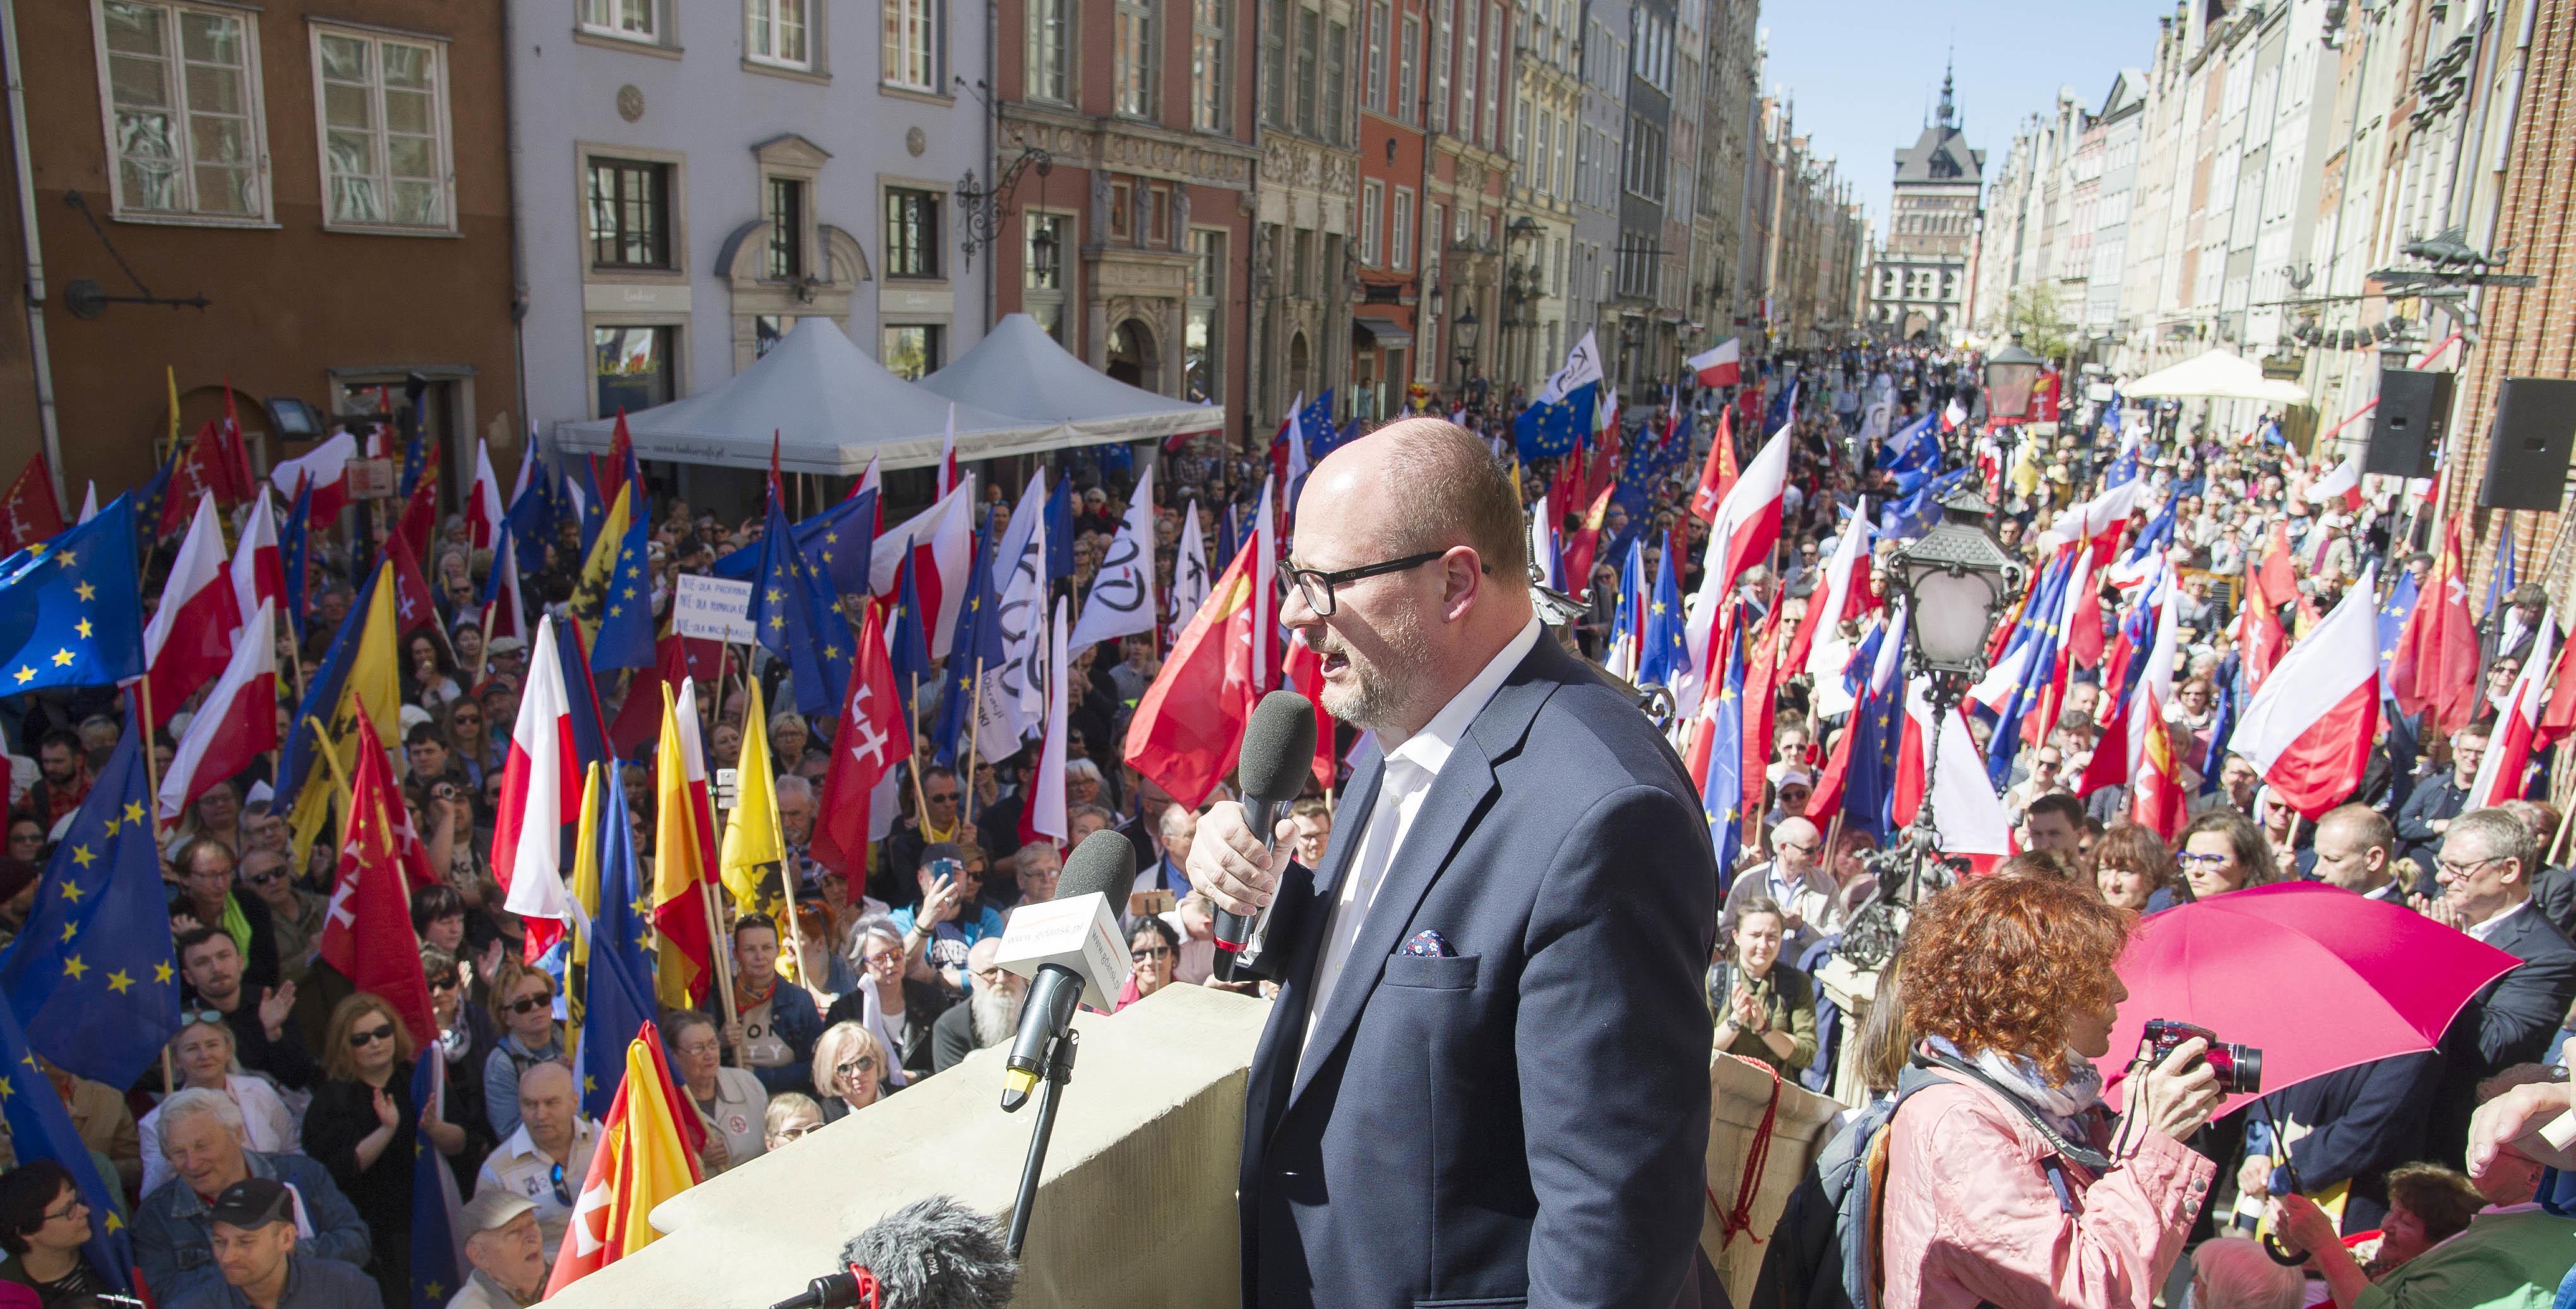 Gdansk Poland Holocaust Survivor Warns Polish Leaders Over Nazi